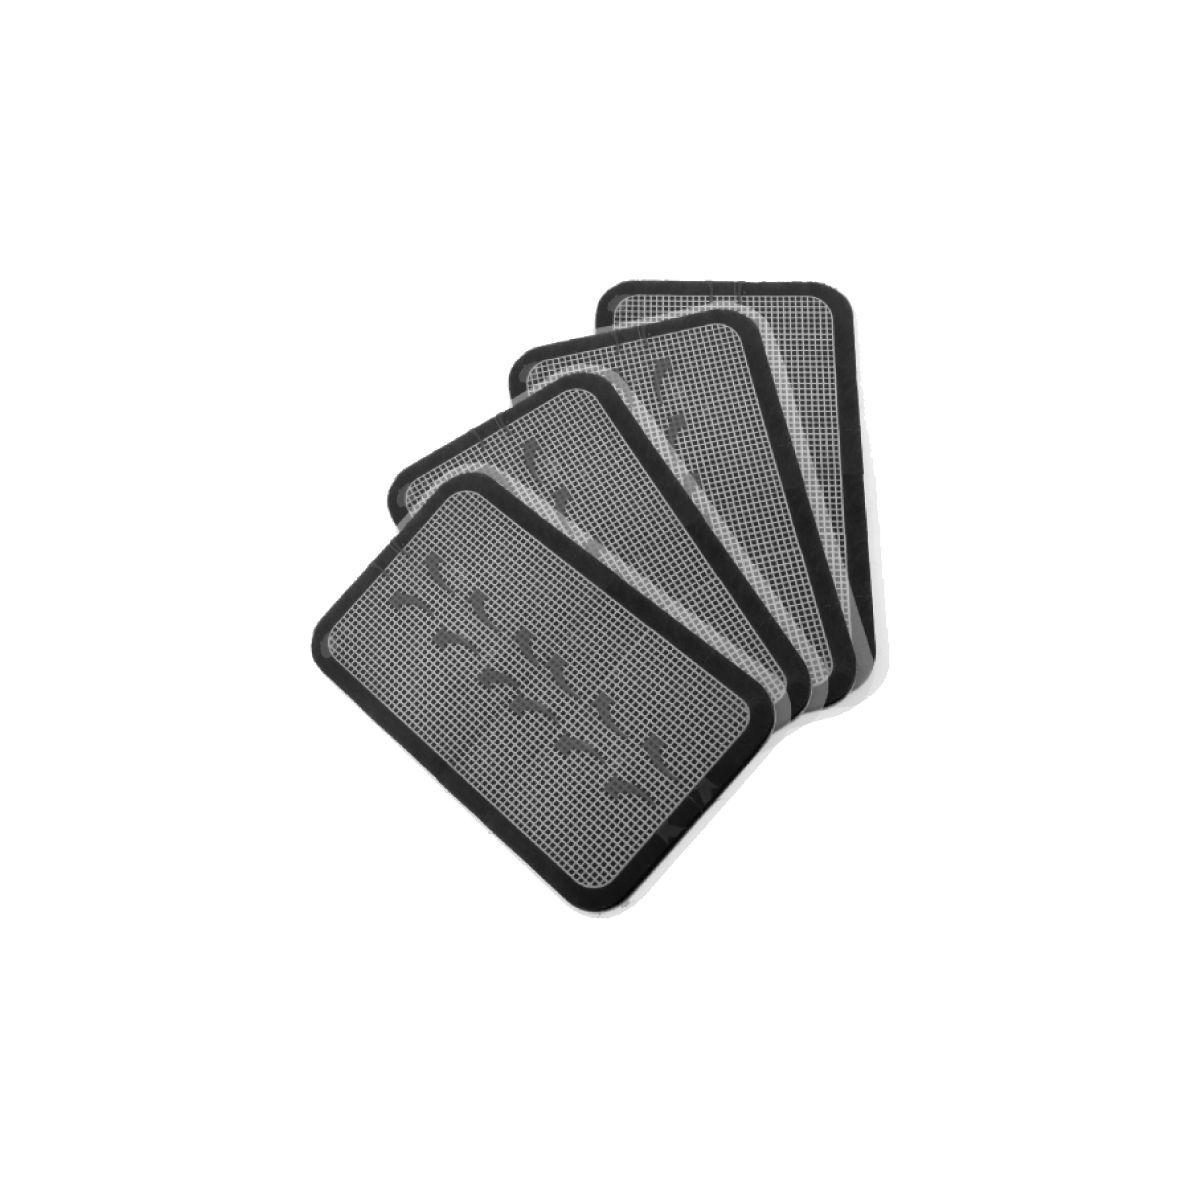 Electro-stim slendertone short bottom - produit coup de coeur webdistrib.com ! (photo)